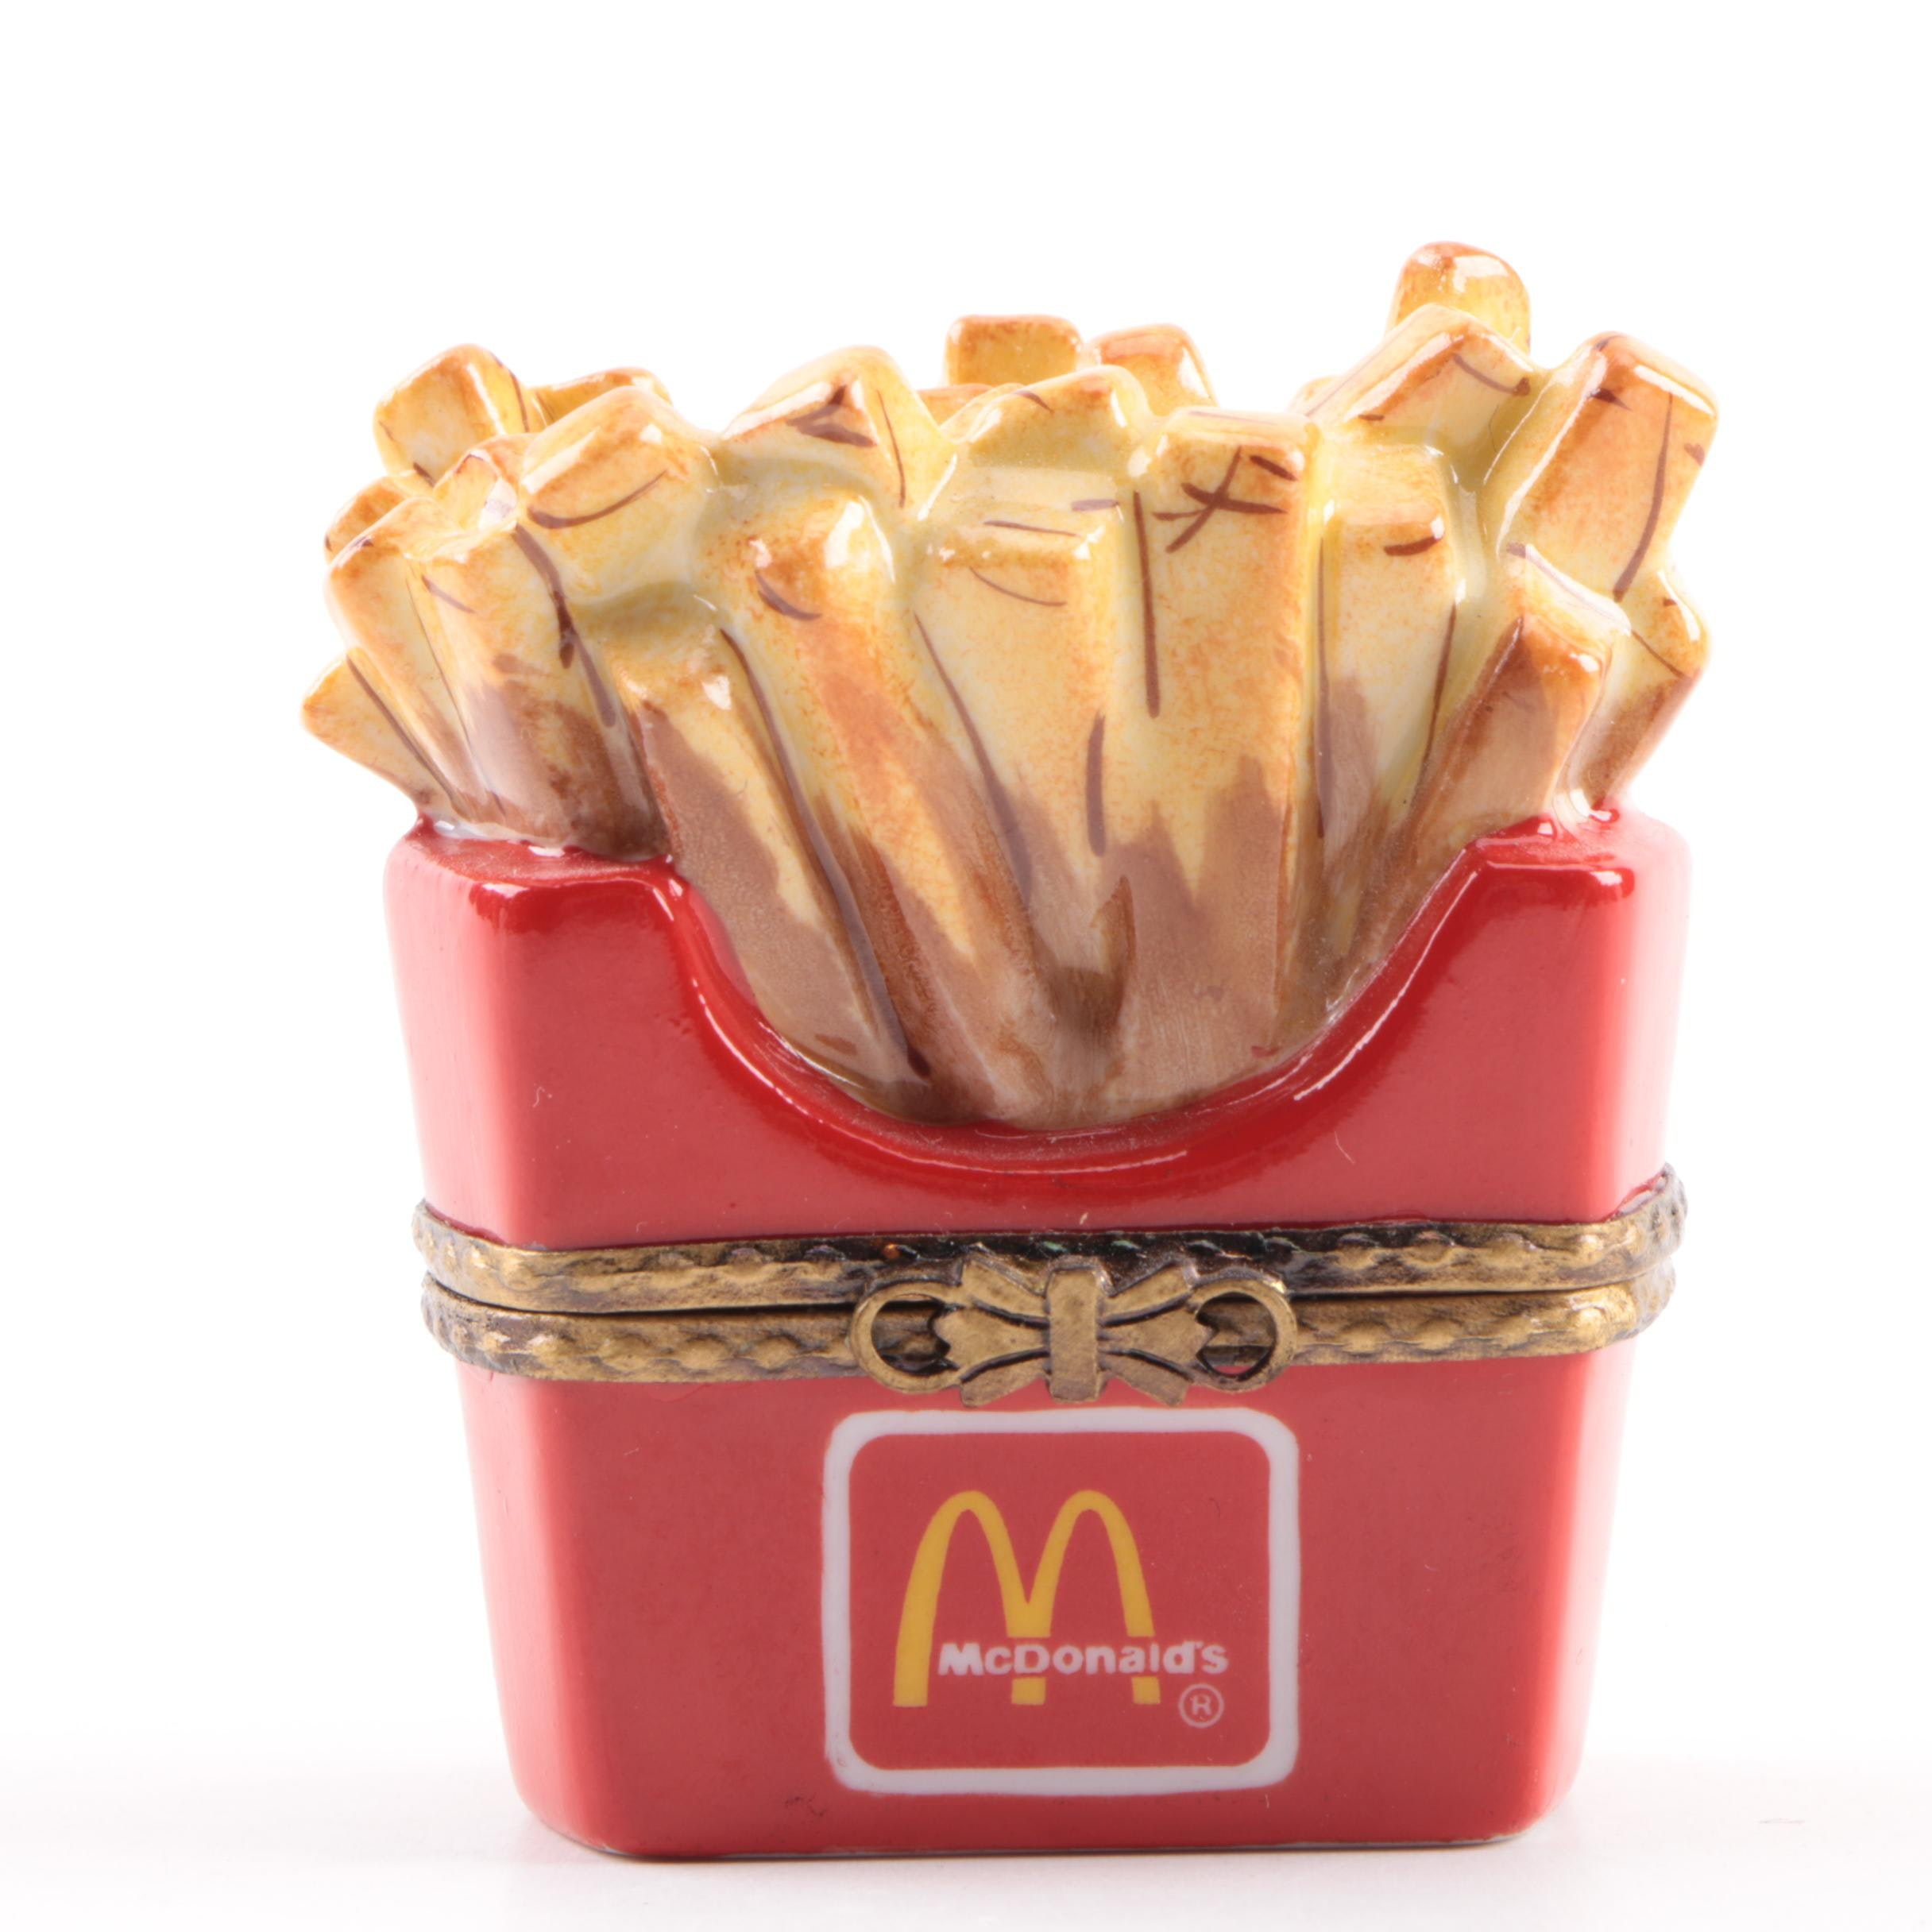 Limoges McDonald's Porcelain Trinket Box